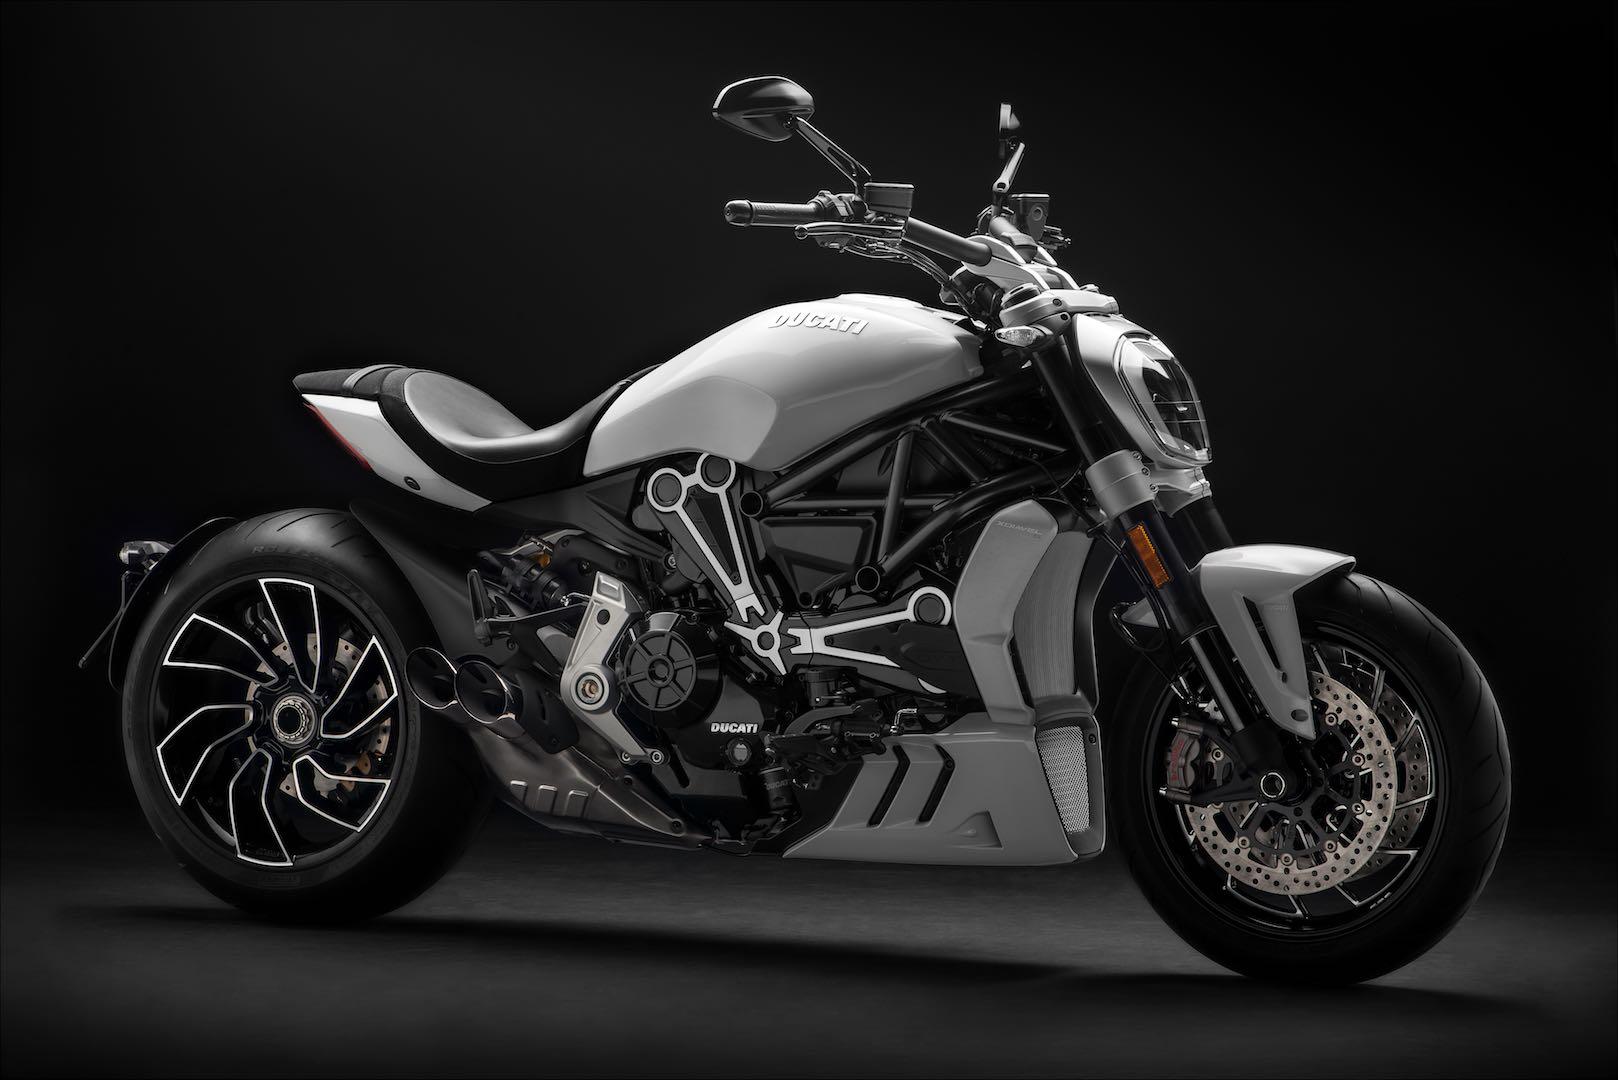 Iceberg White Ducati XDiavel S Unveiled at Faaker See Custom Show